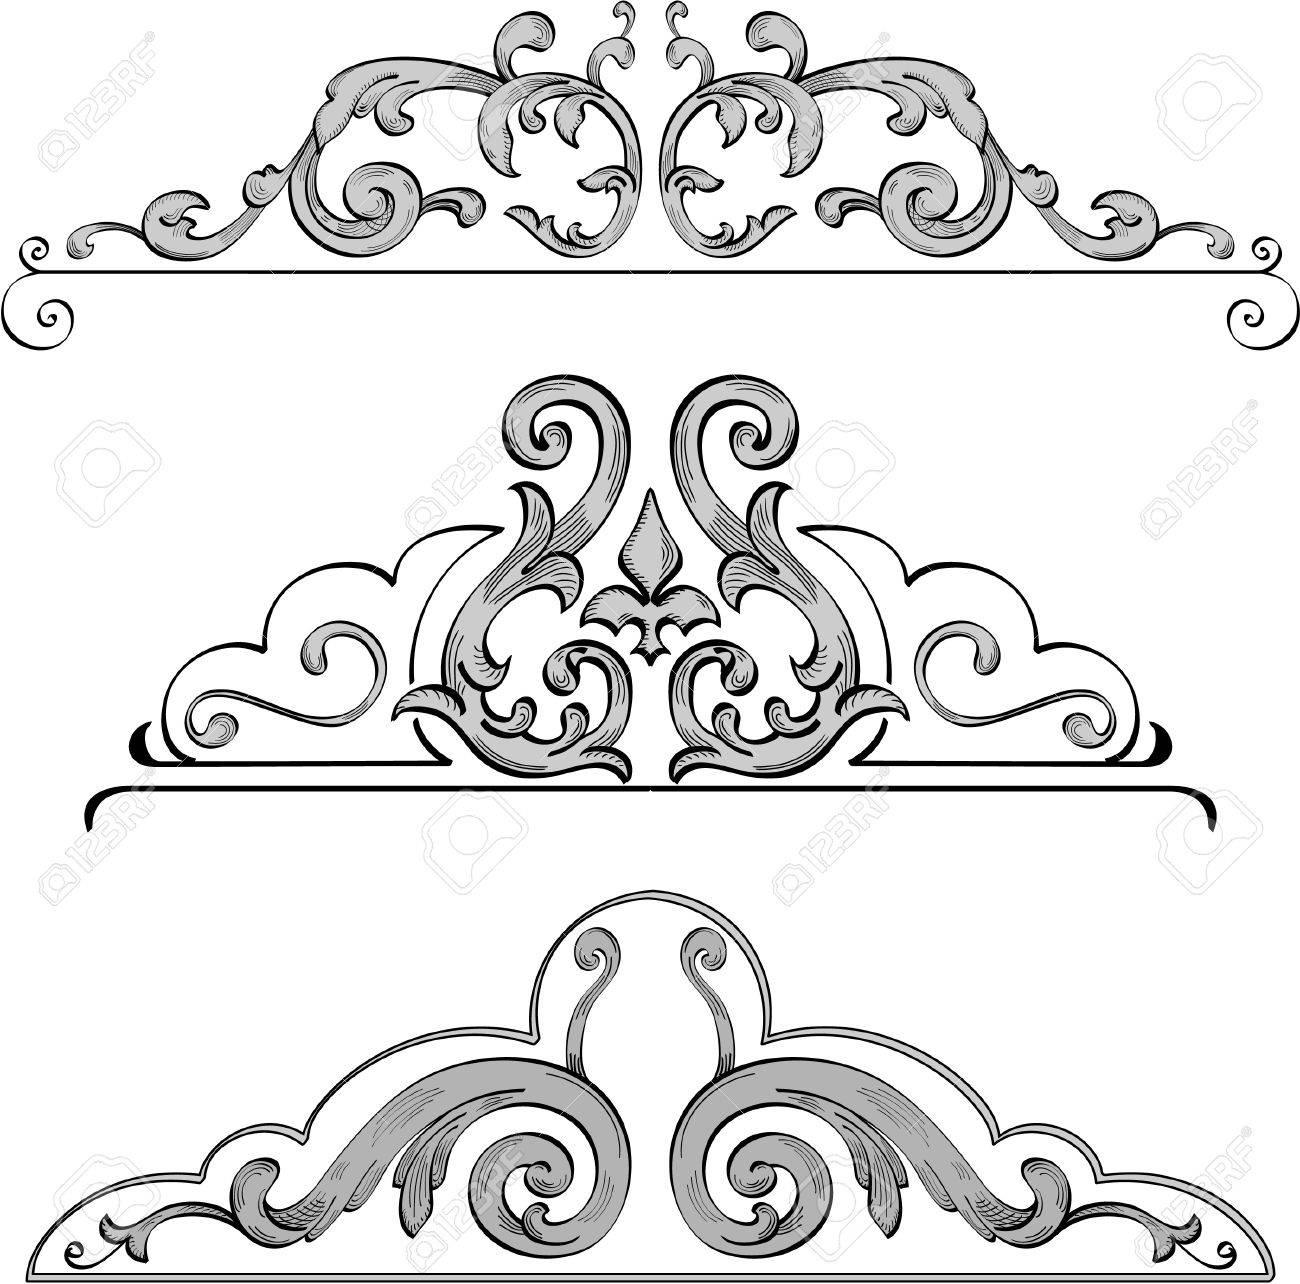 design elements for nice frames Stock Vector - 11998257